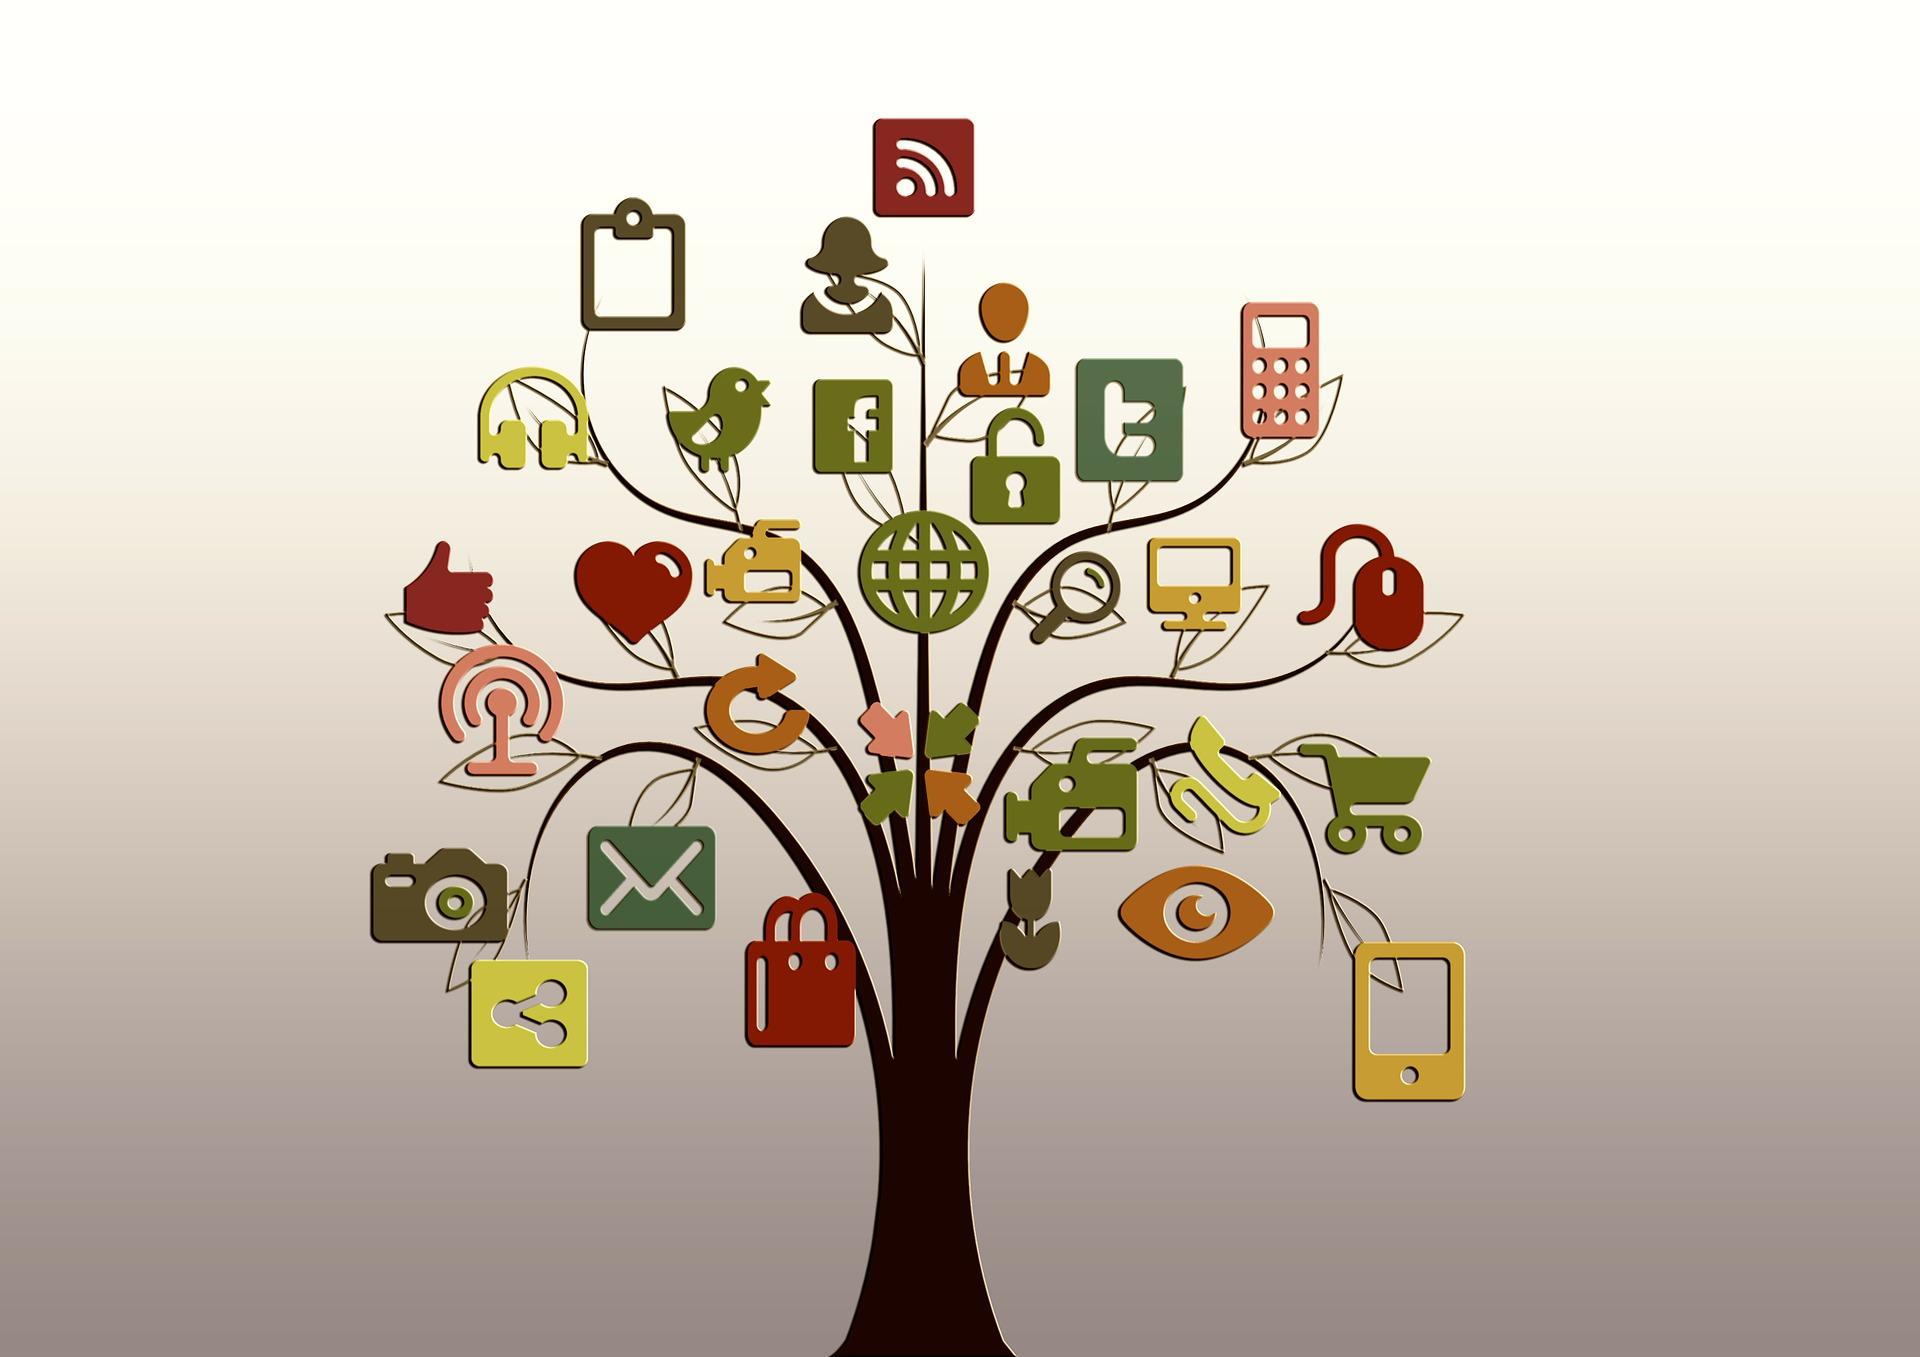 tree 200795 1920 - 表示されない?!Wordpressウィジェットの作成・編集方法・おすすめまで完全解説